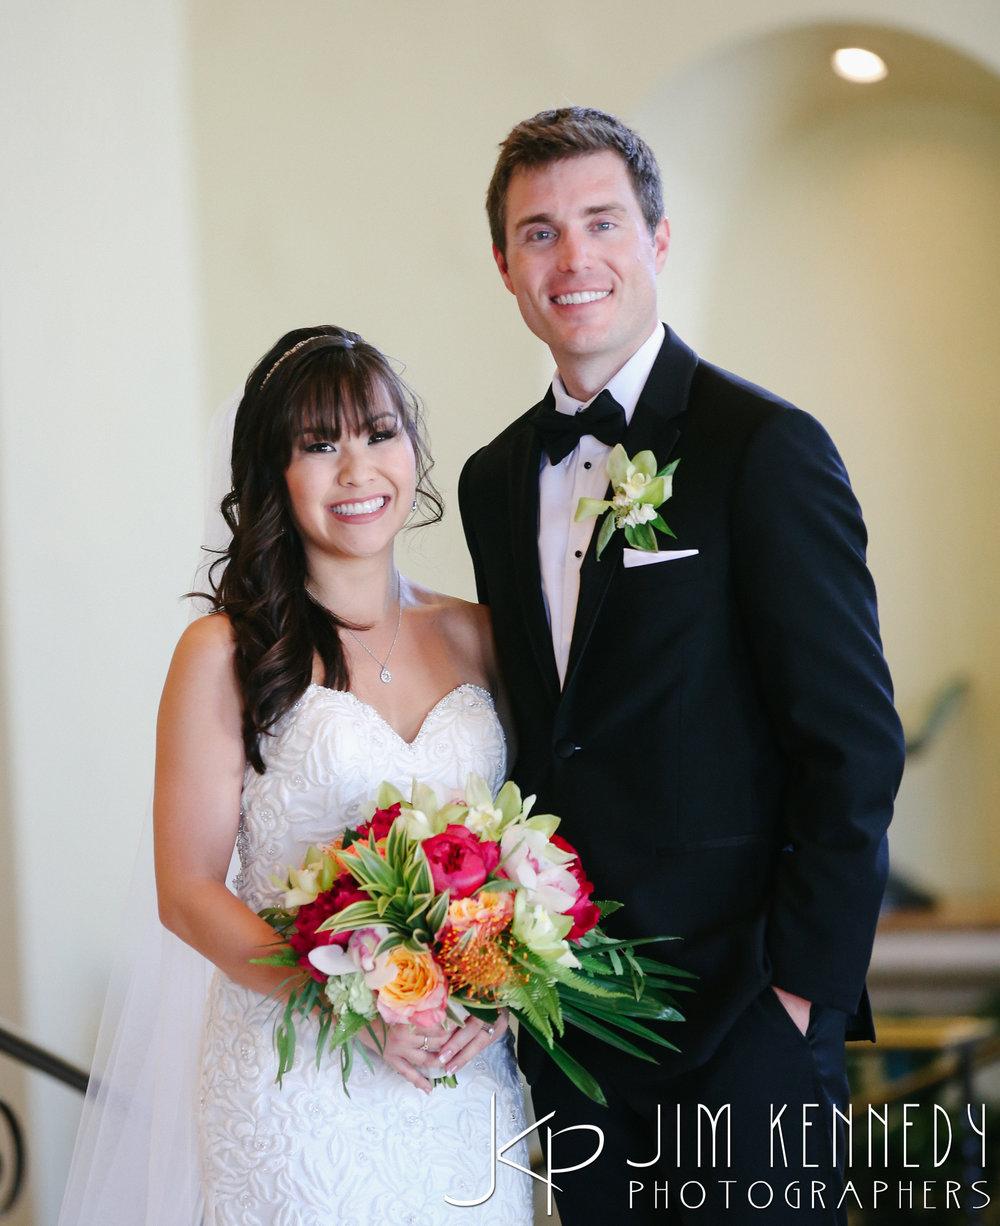 hyatt-huntington-beach-wedding-april-marcus_0119.JPG